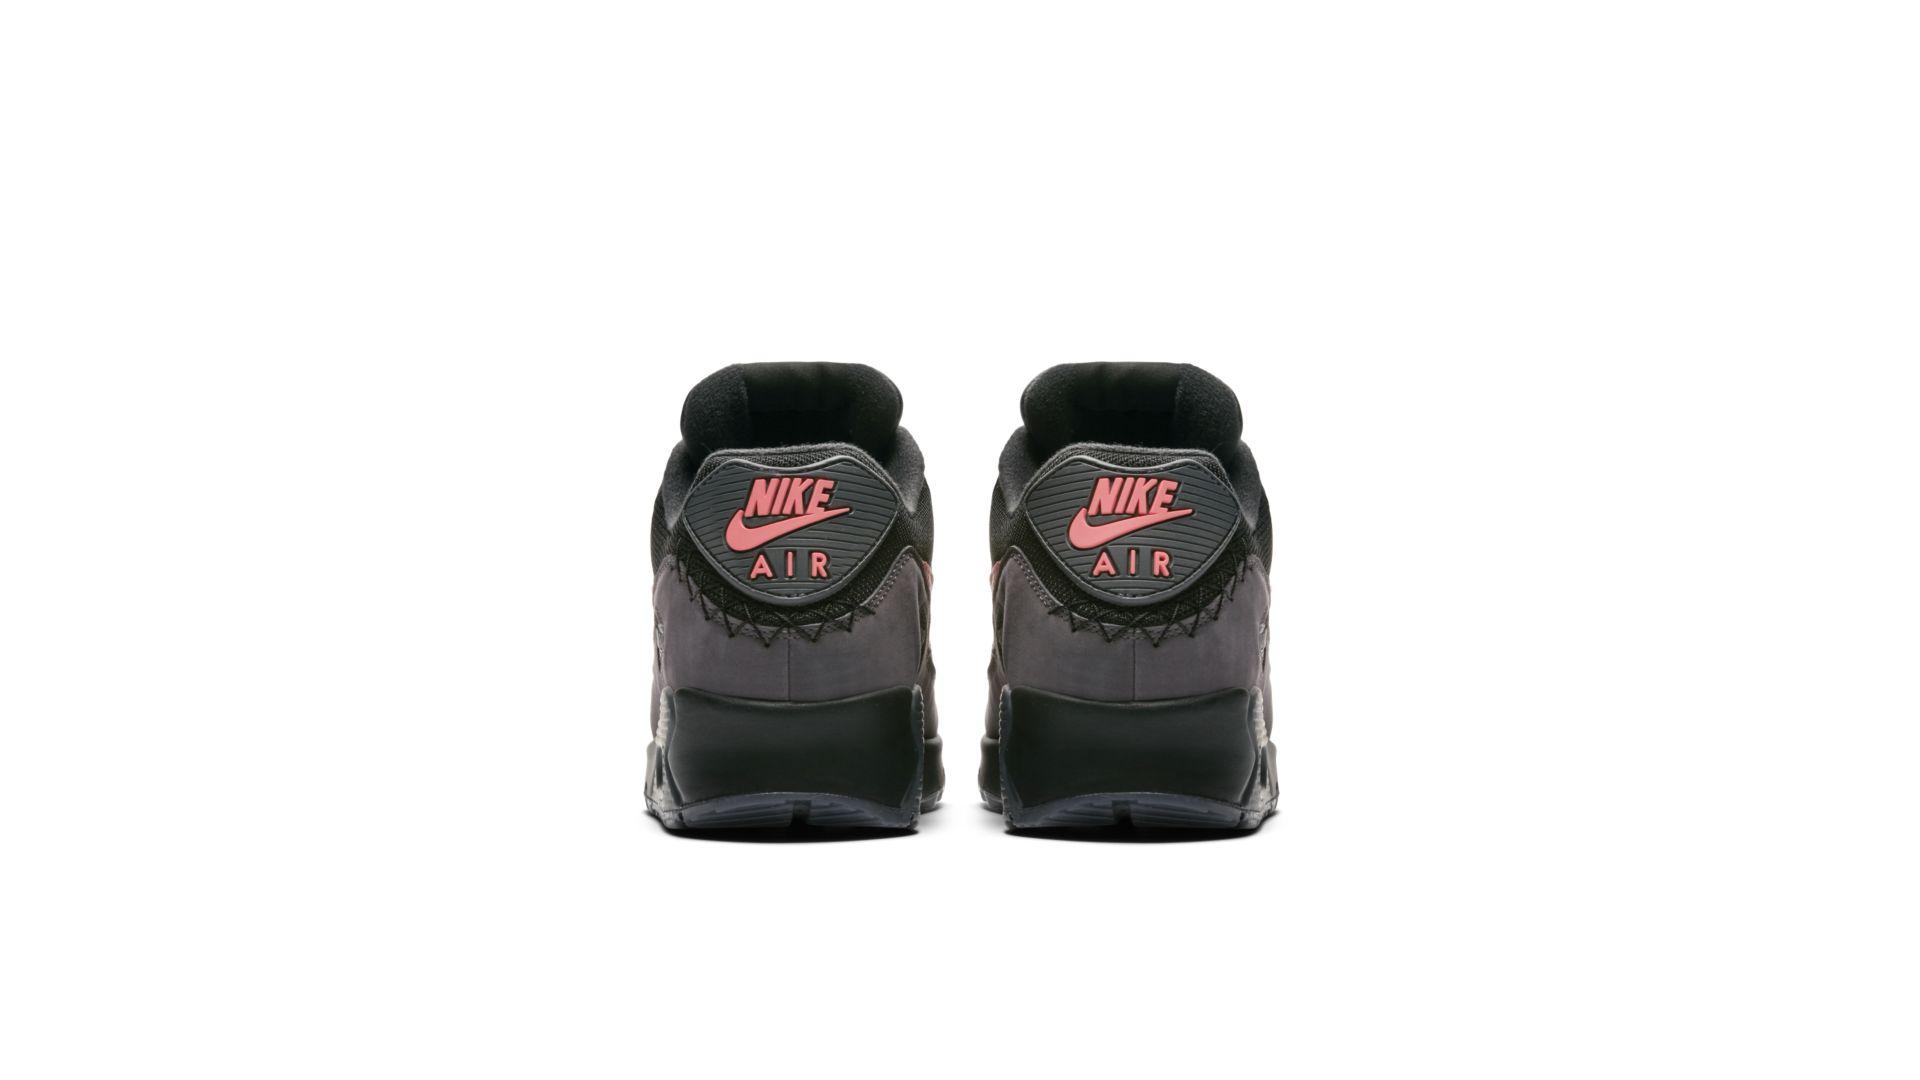 Nike Air Max 90 Mixtape B-Side (CI6394-001)